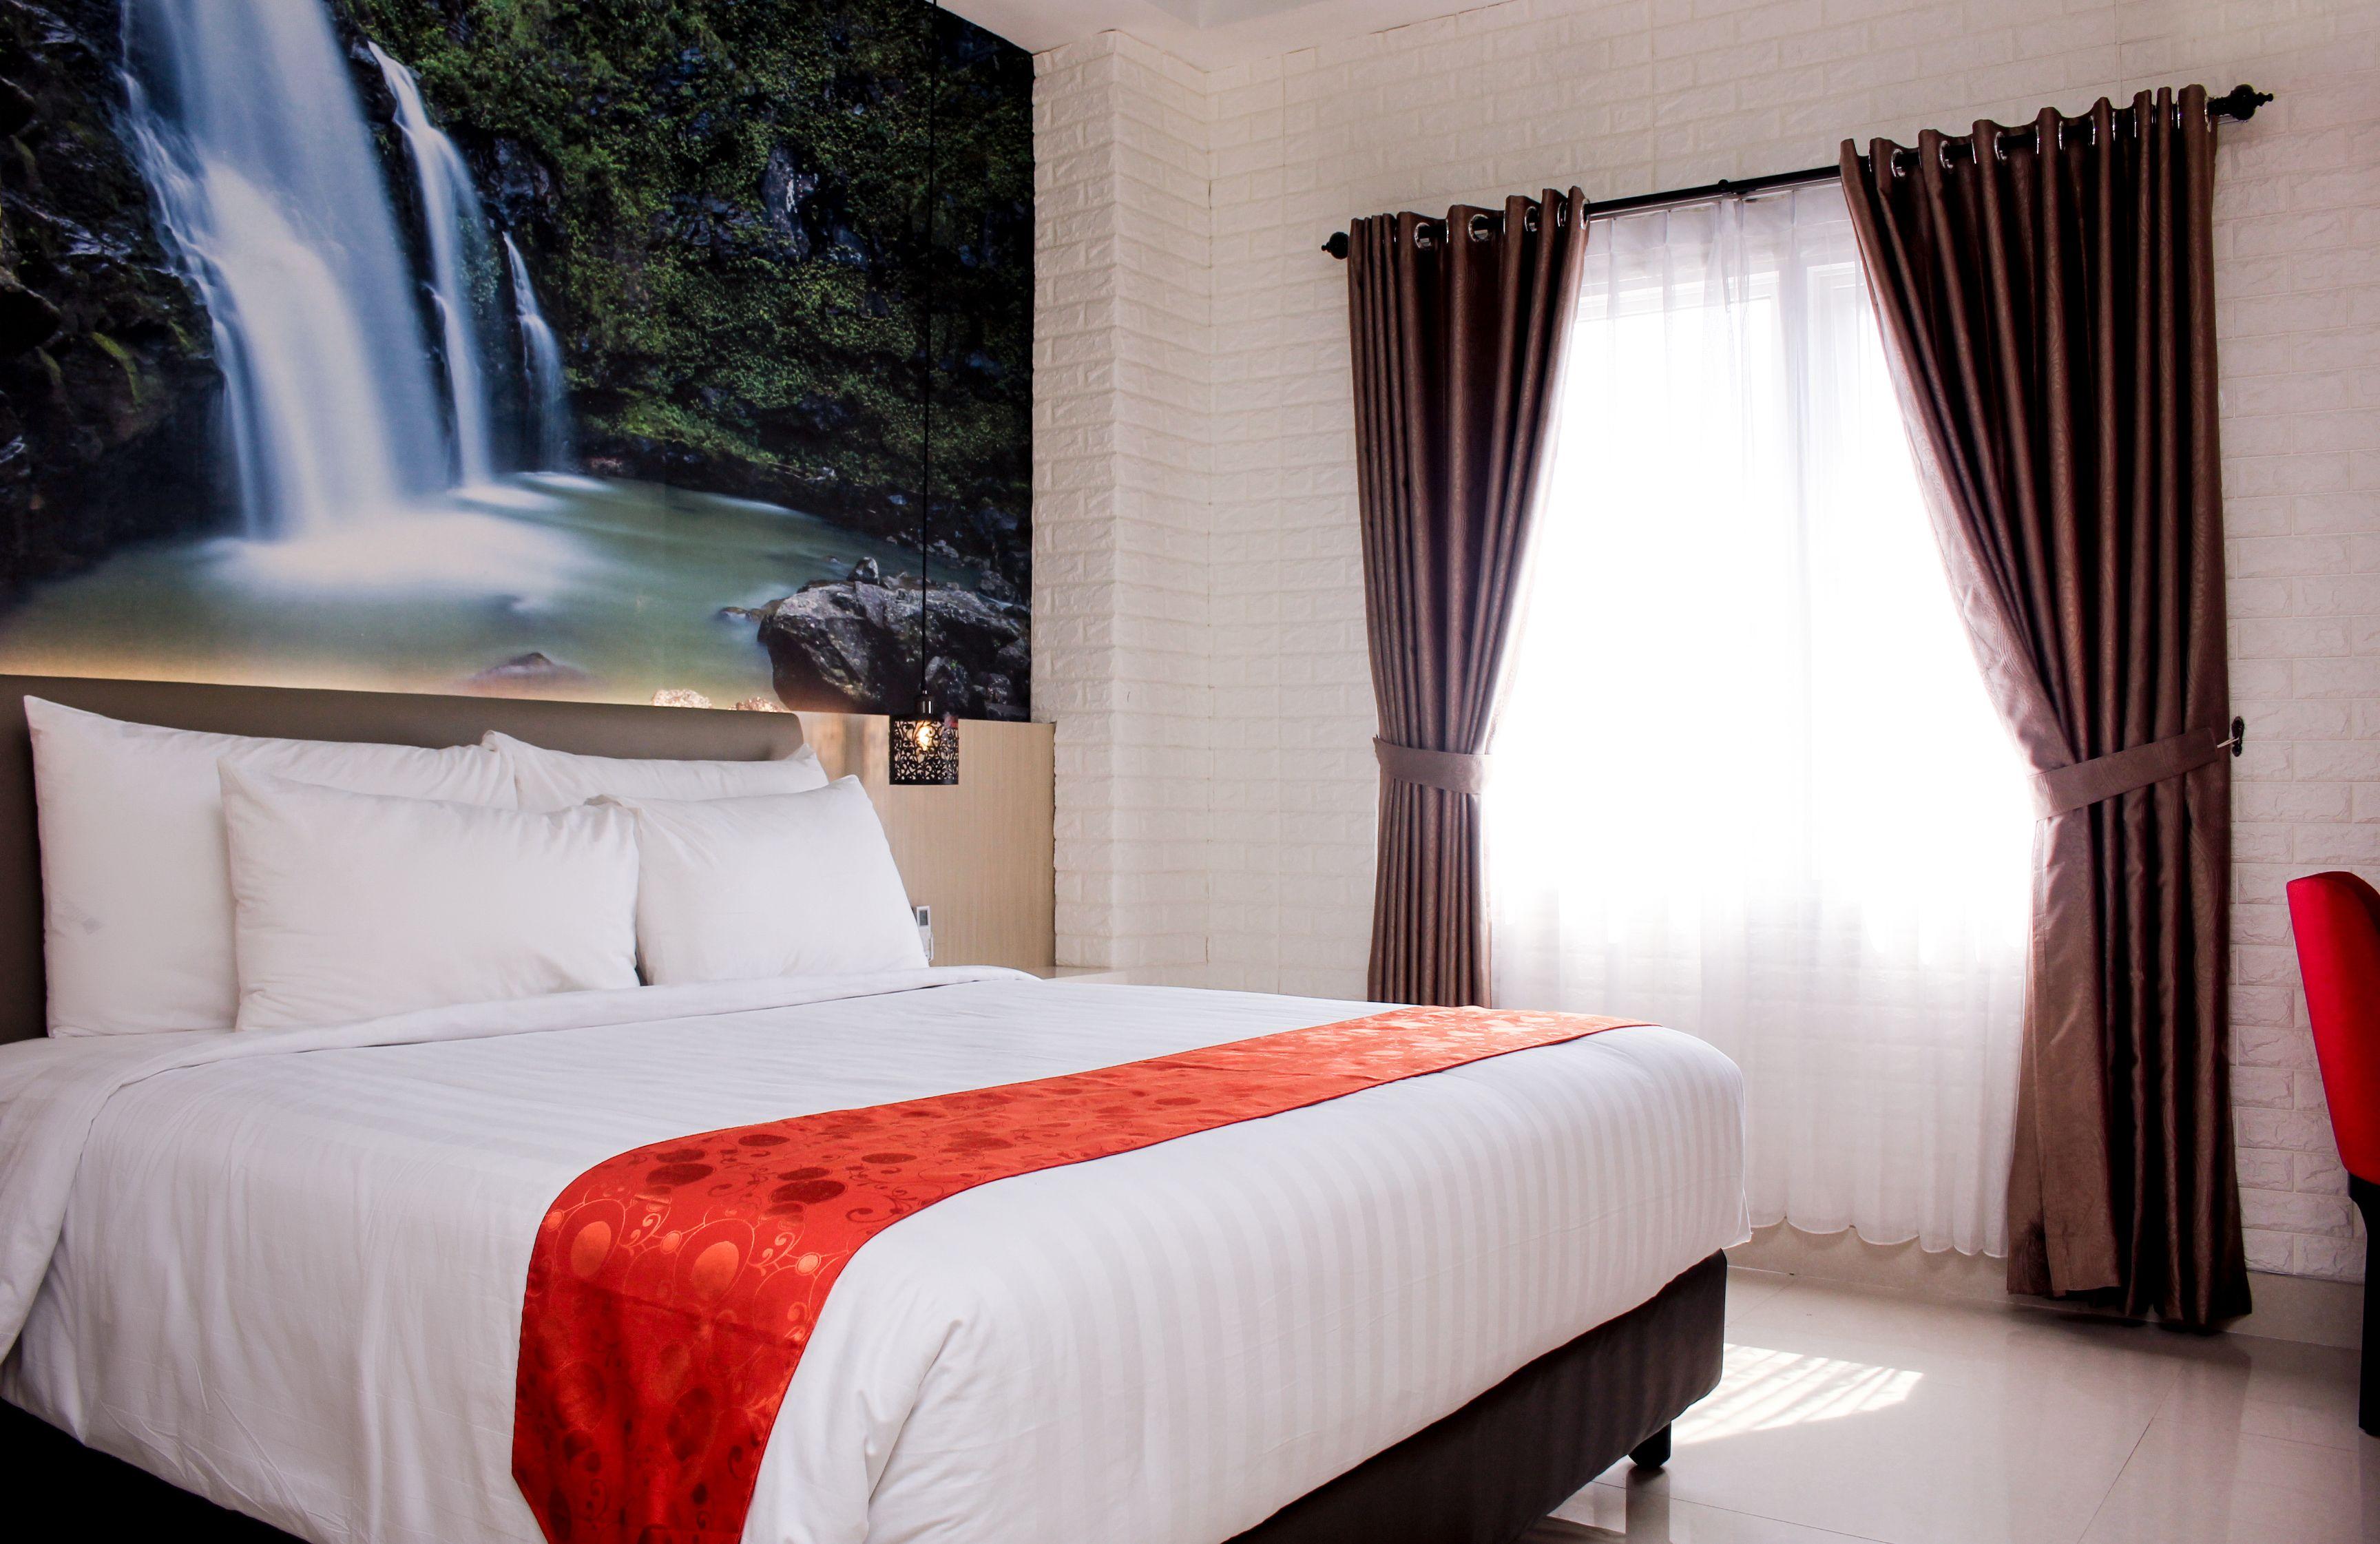 Premiere Hotel Tegal, Tegal